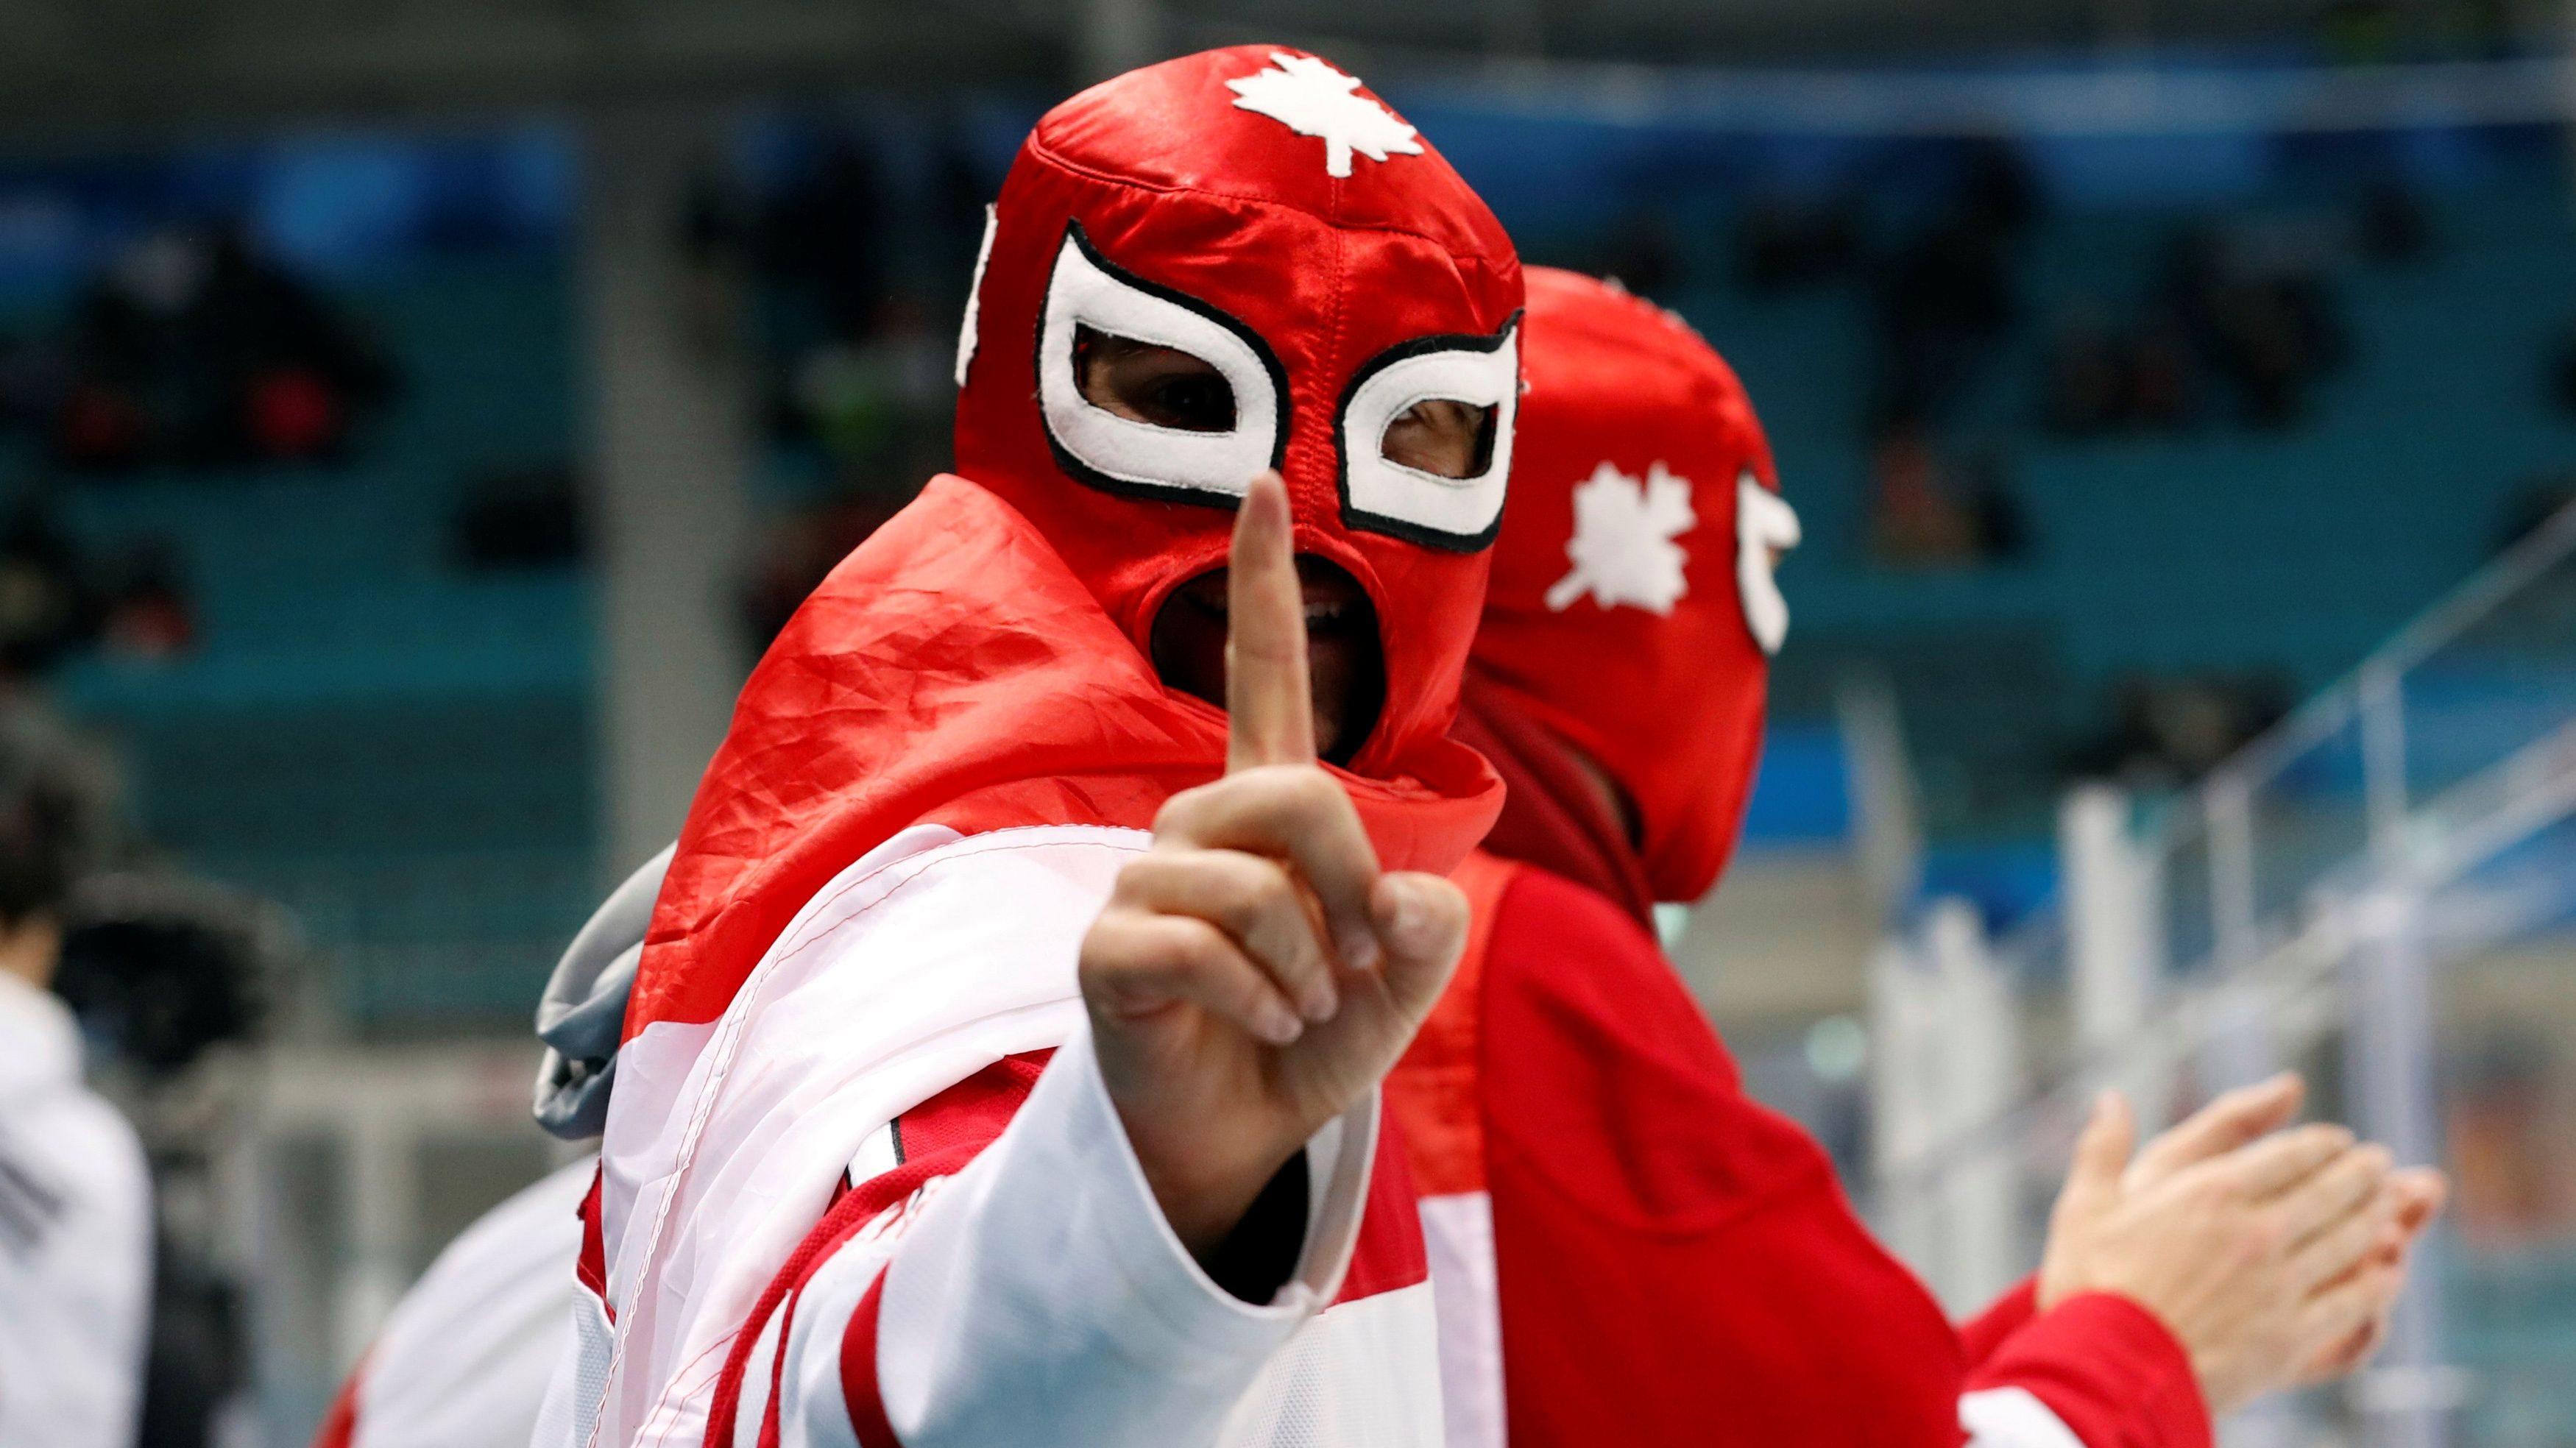 Ice Hockey - Pyeongchang 2018 Winter Olympics - Men Semifinal Match - Canada v Germany - Gangneung Hockey Centre, Gangneung, South Korea - February 23, 2018 - Fans of Team Canada react. REUTERS/Kim Kyung-Hoon - HP1EE2N0XI87O